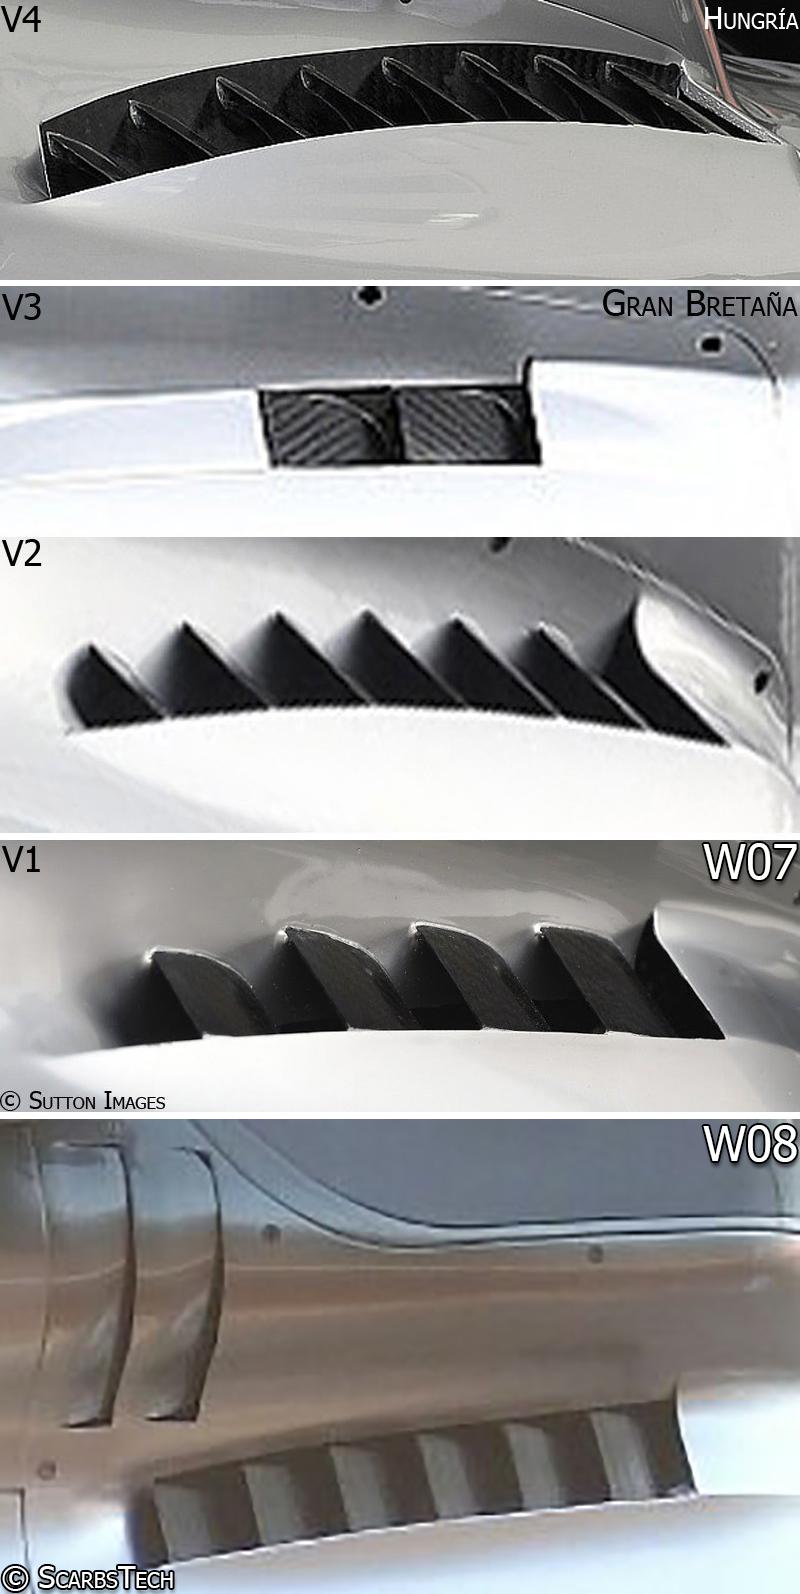 w08-cooling